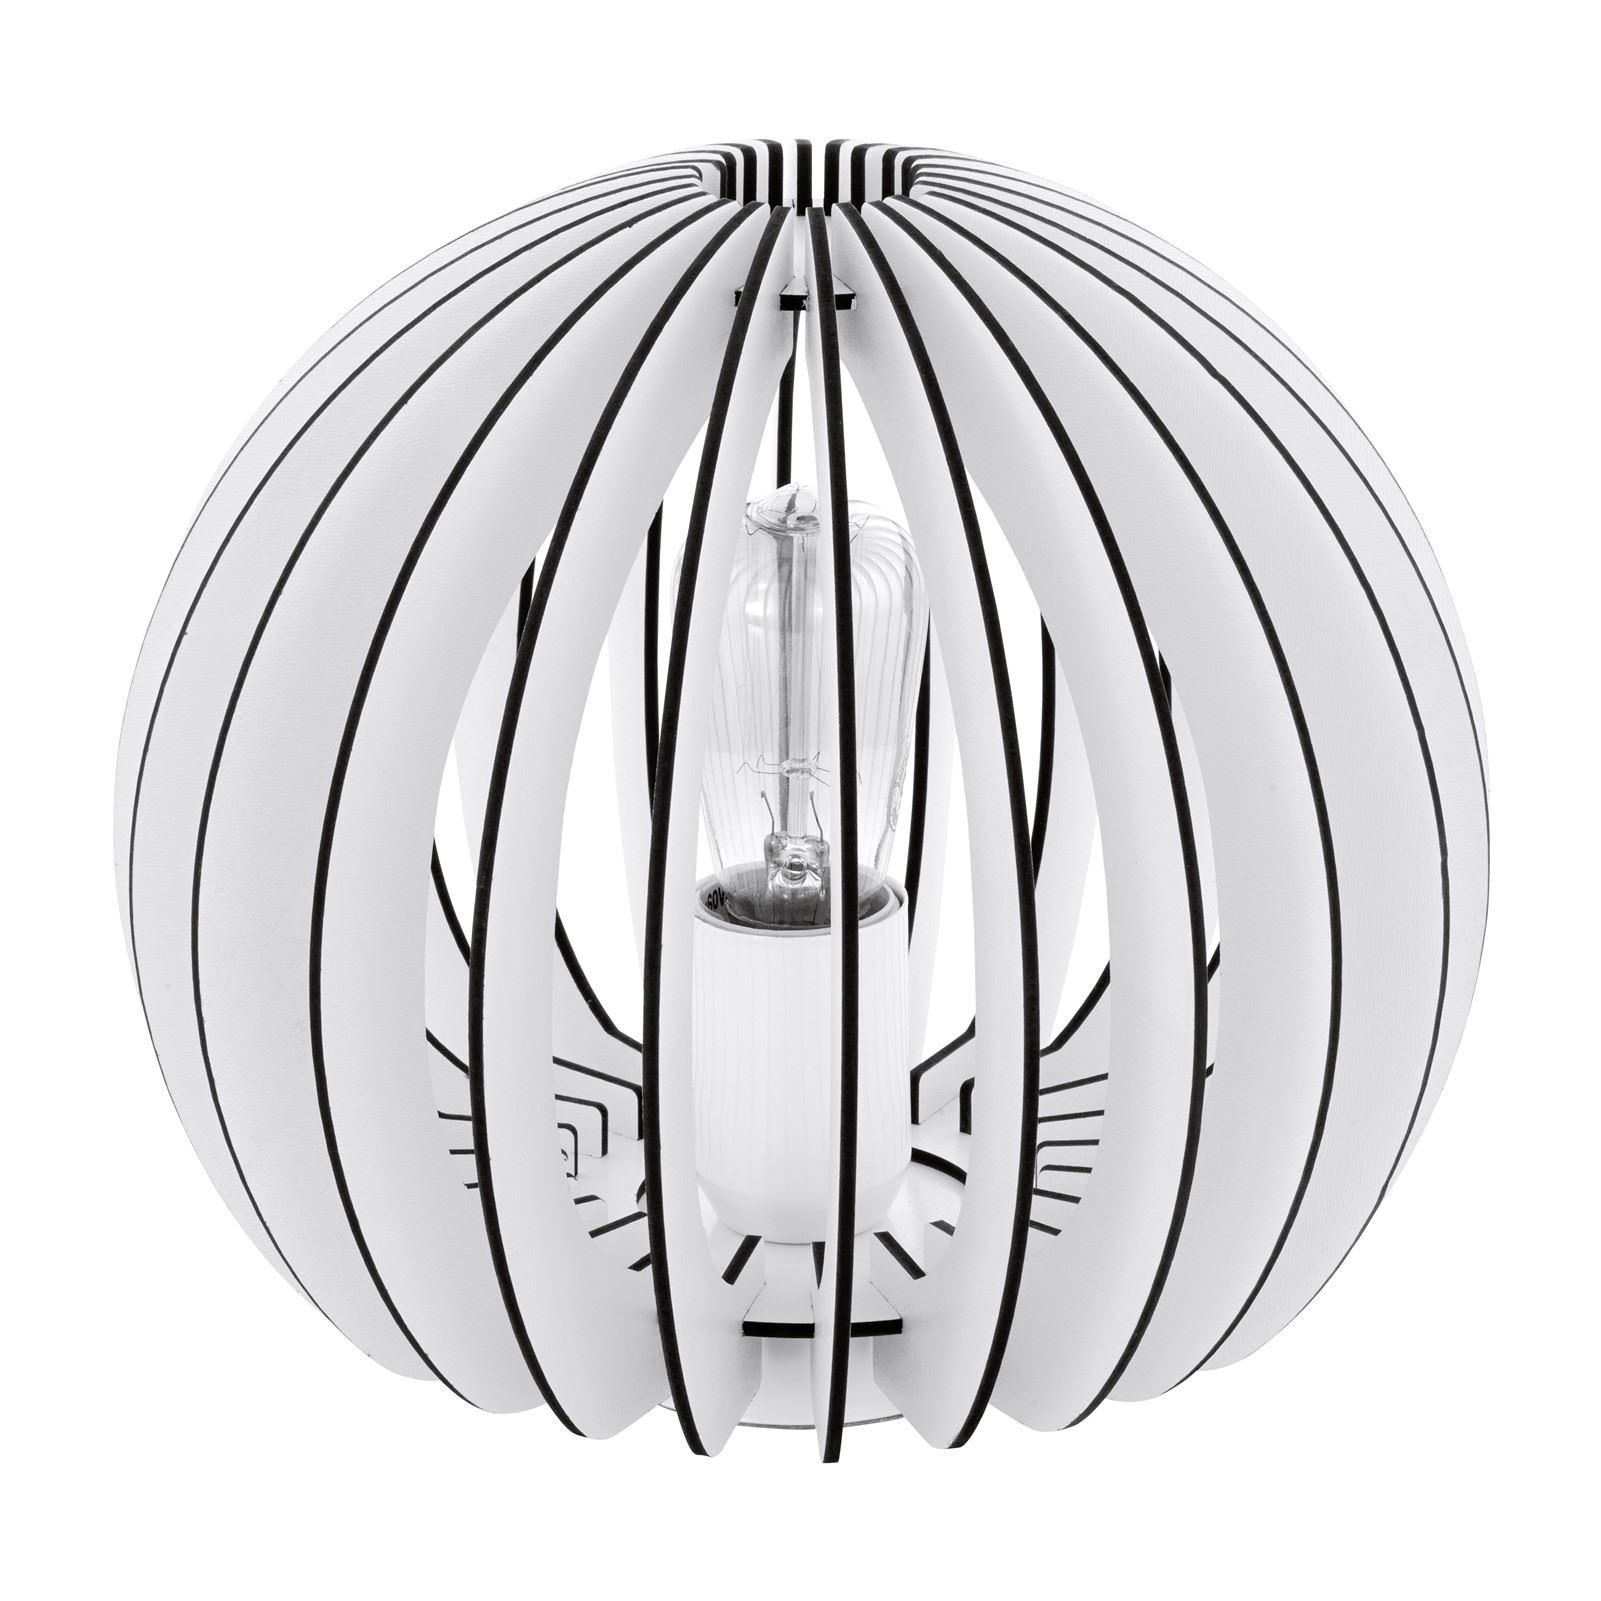 Cossano Table Lamp 1 Light E27 Steel White Base - Home Decor